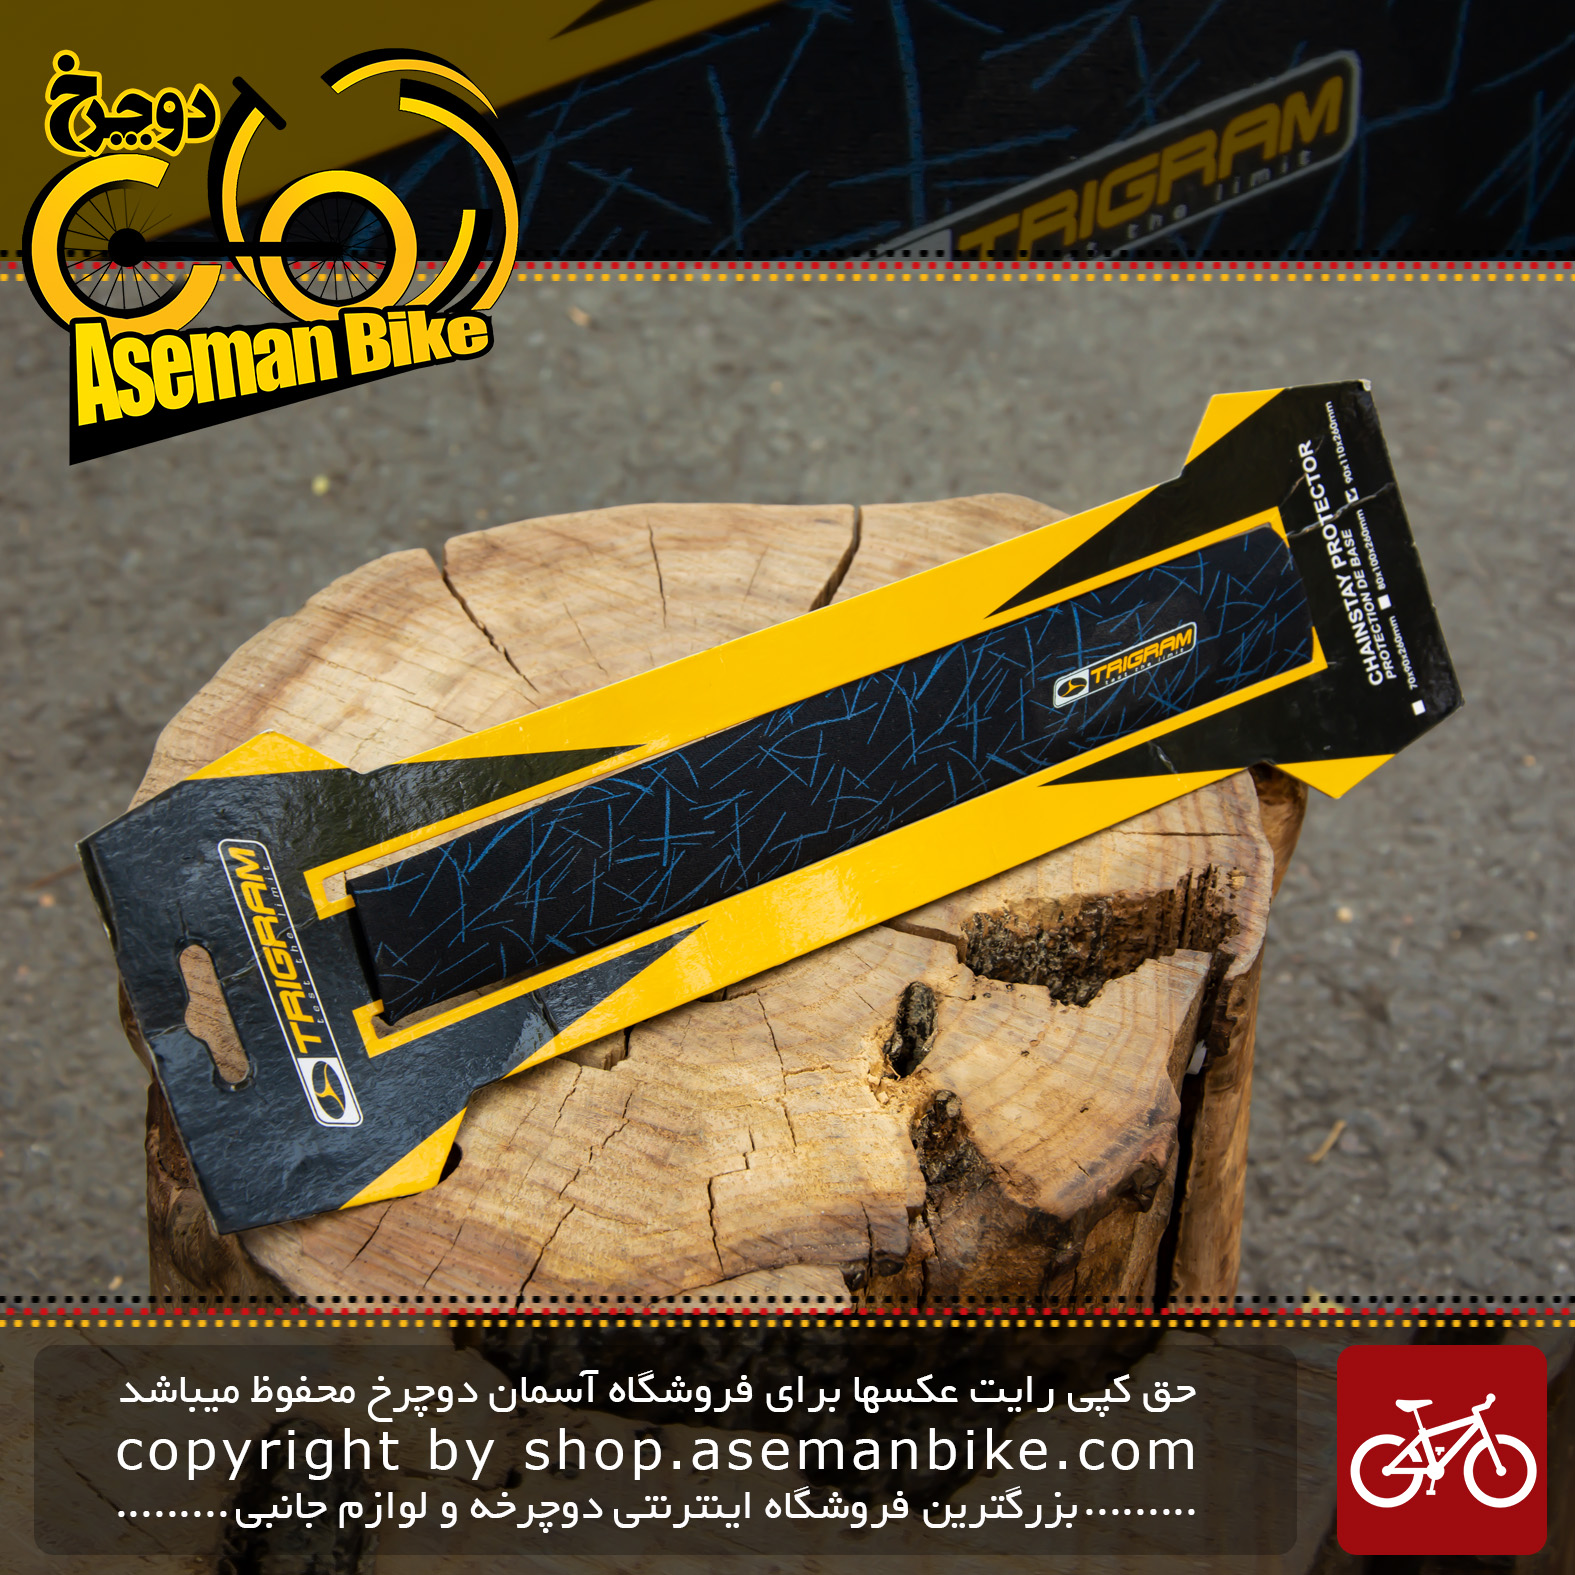 کاور بدنه دوچرخه رام عقب برند تریگرام Trigram Bicycle Chainstay Protector